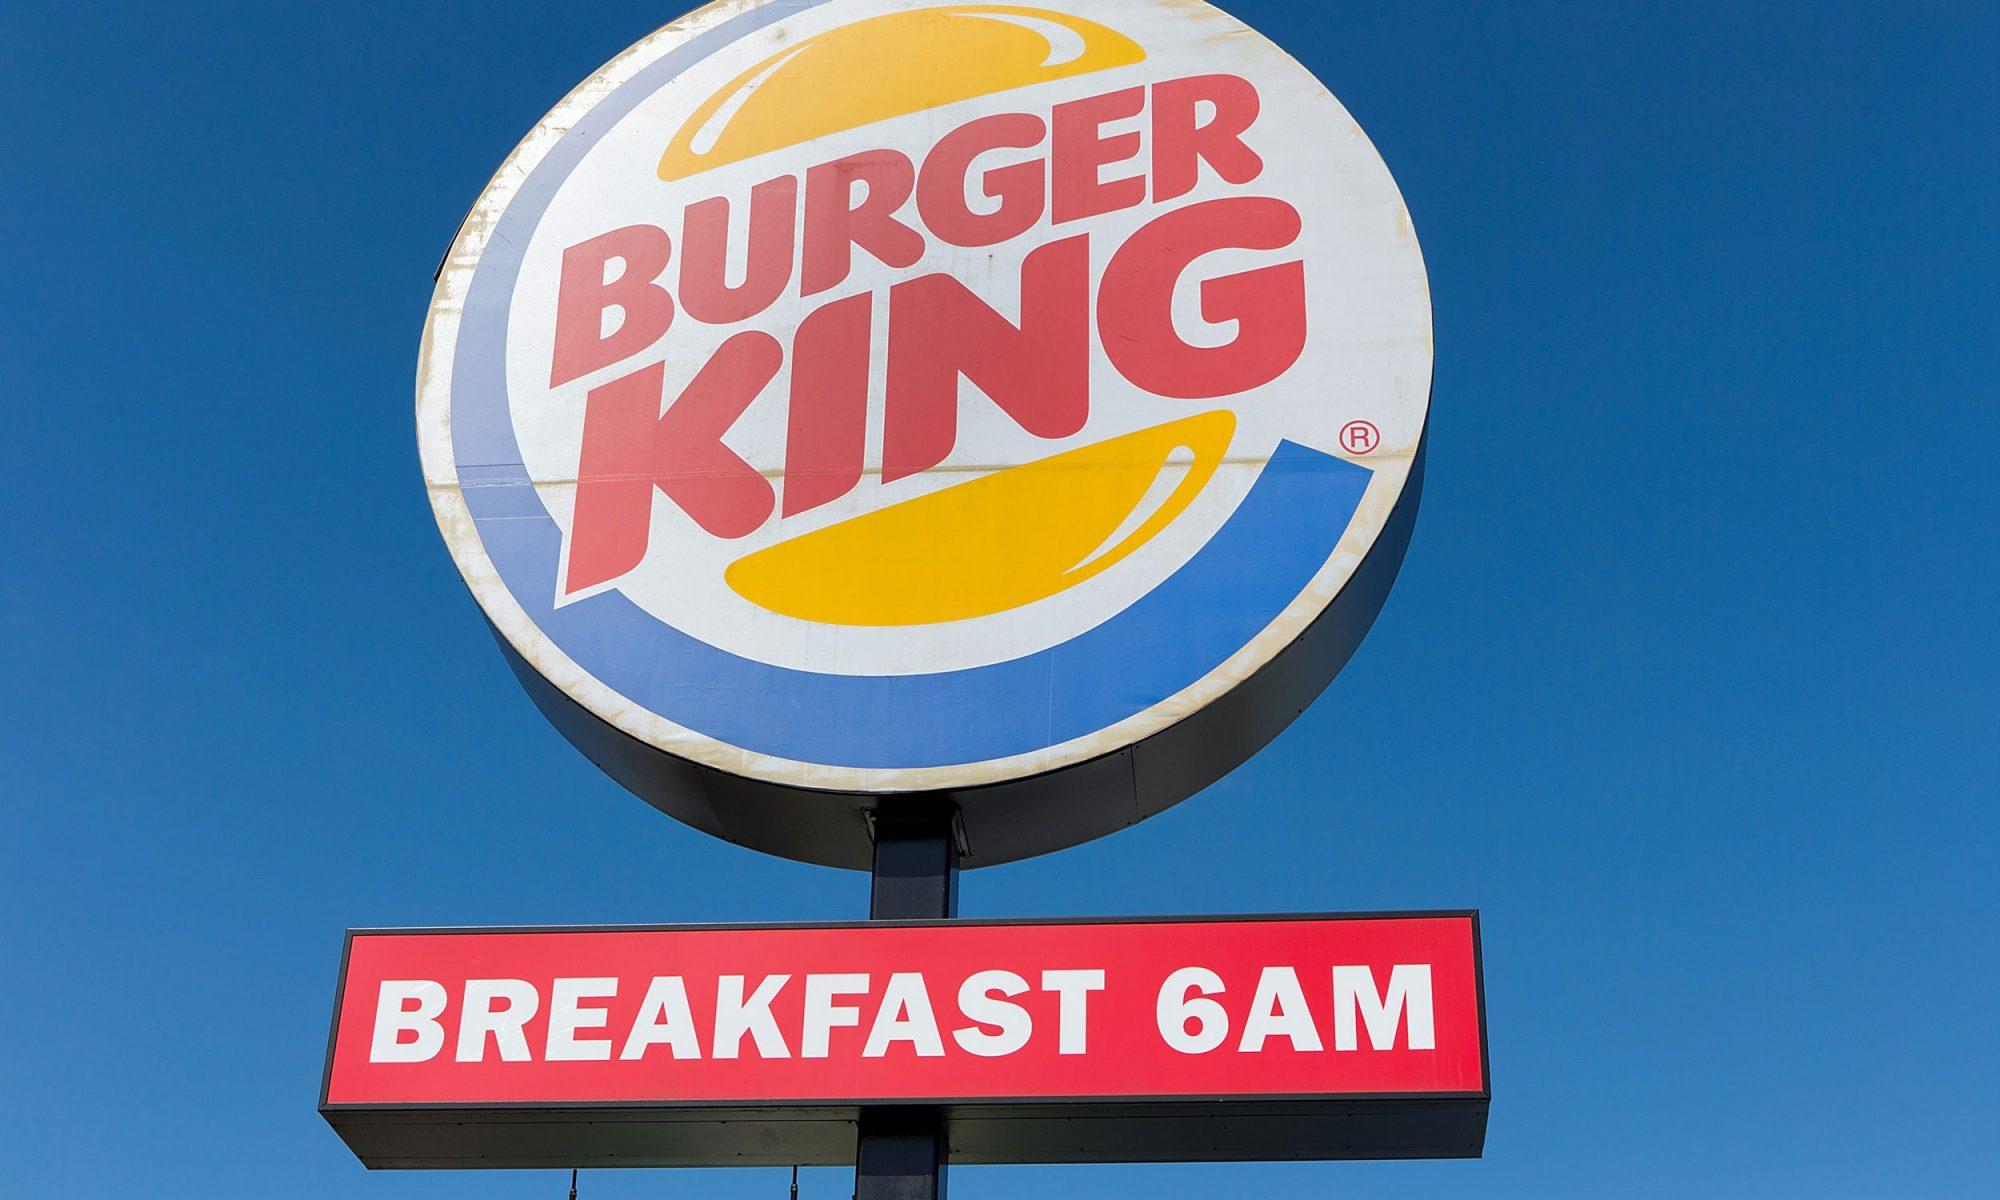 EC: Burger King May Owe You 5 Bucks If You Eat Its Breakfast Sandwiches